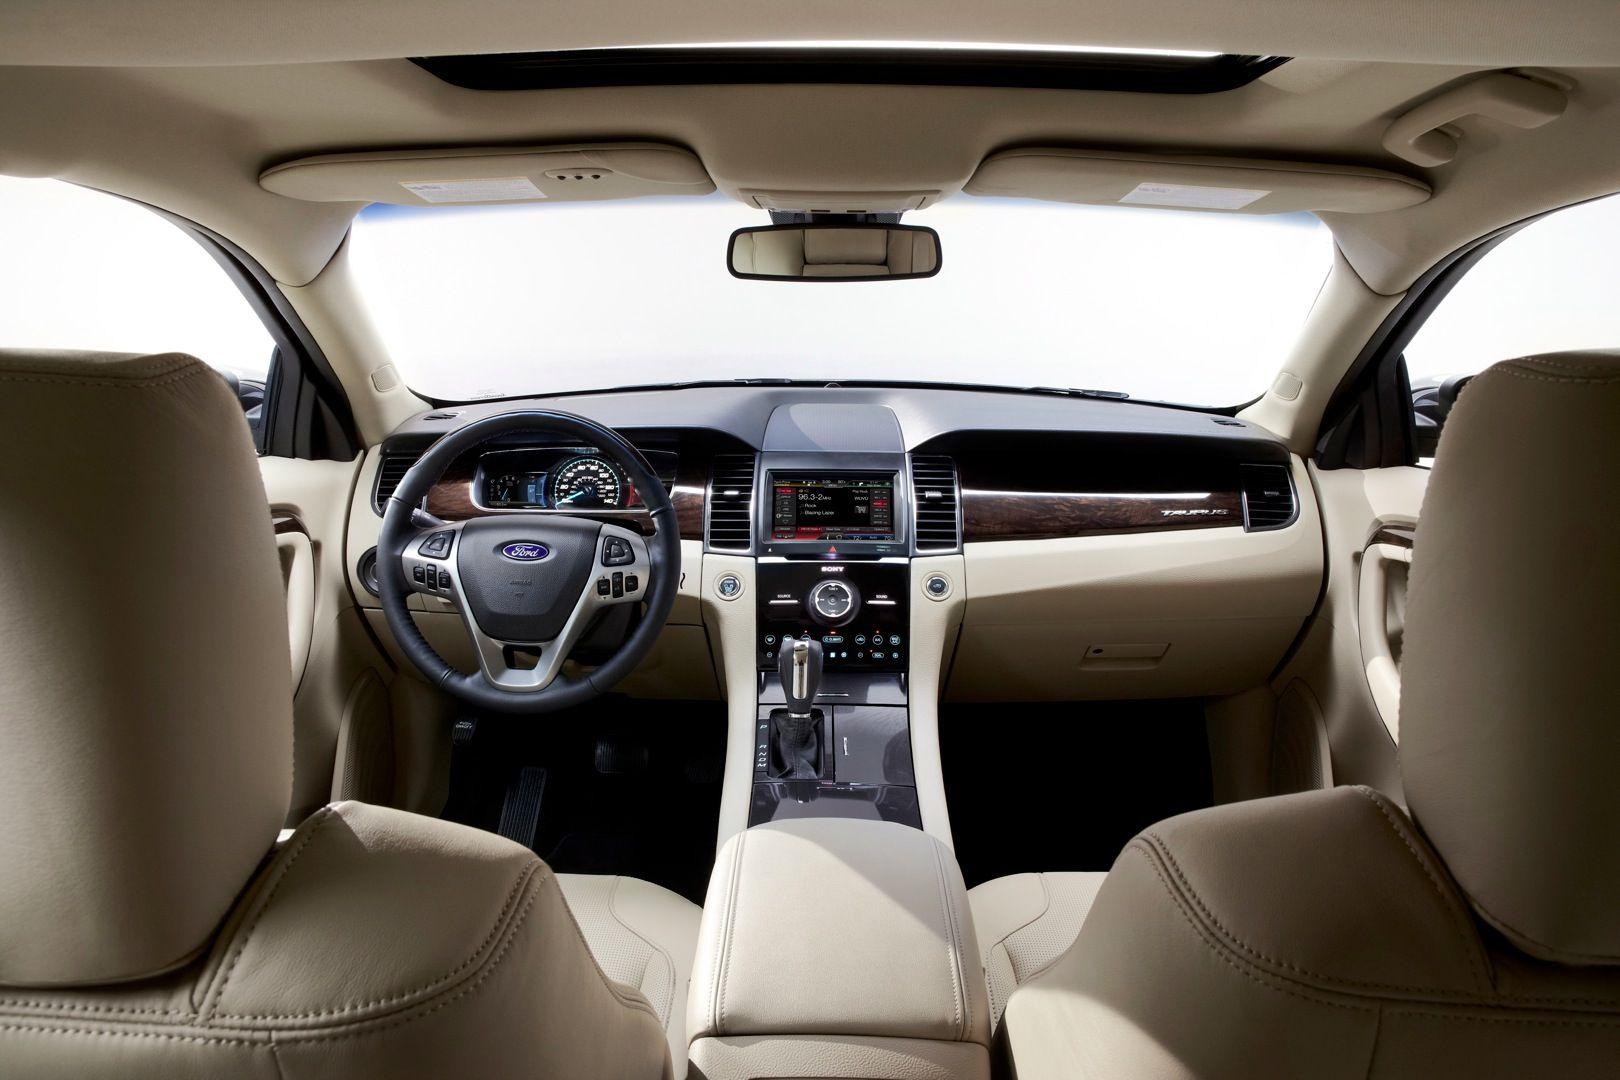 Http S1 Aecdn Com Images Gallery Fordtaurus 4569 9 Jpg Ford Taurus Sho 2014 Ford Taurus Vw Passat